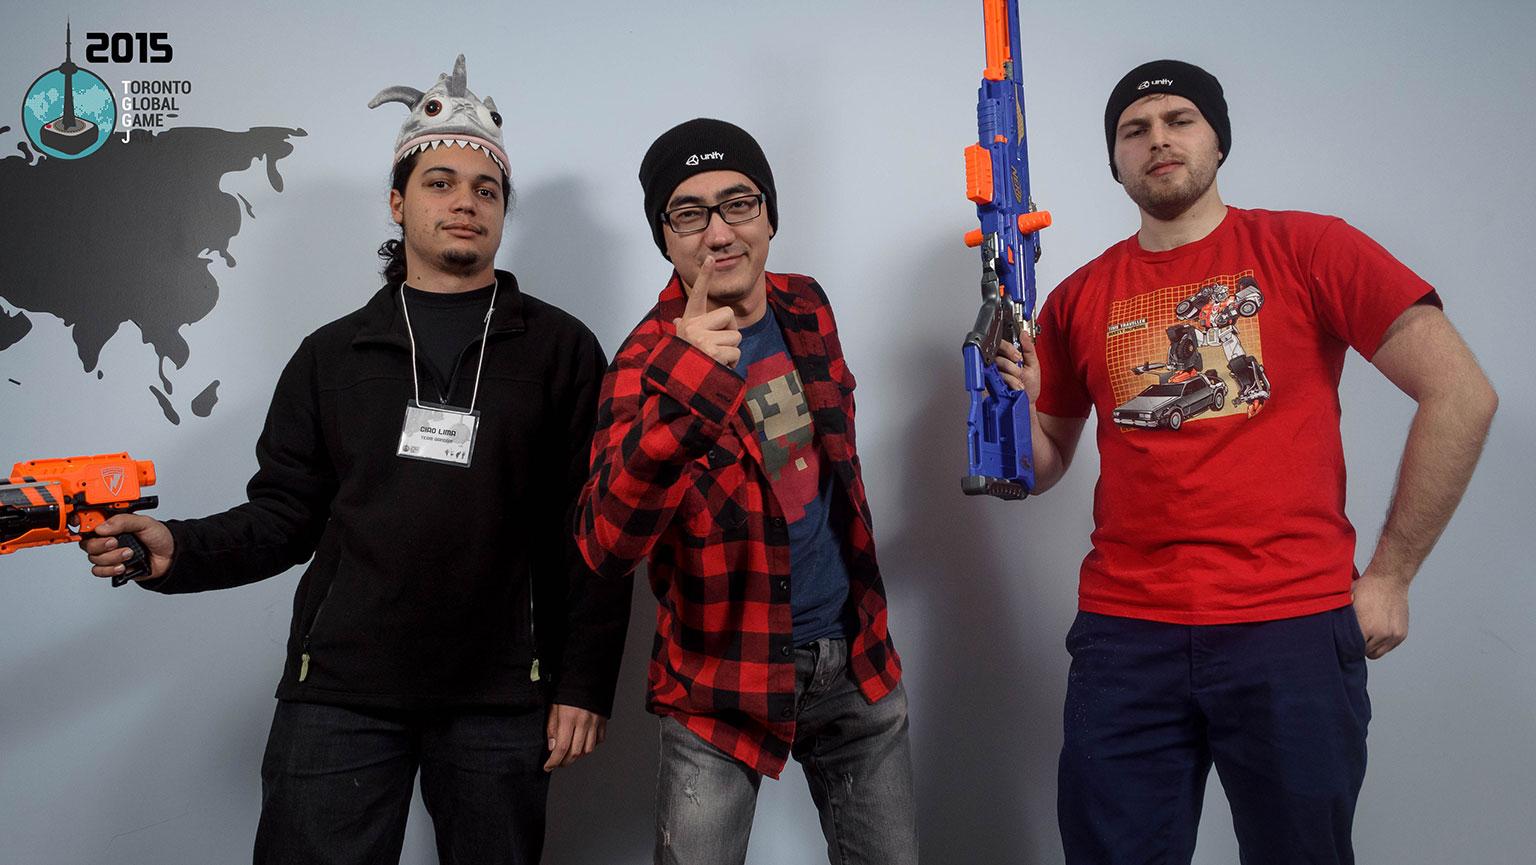 Photograph courtesy of Toronto Global Game Jam 2015